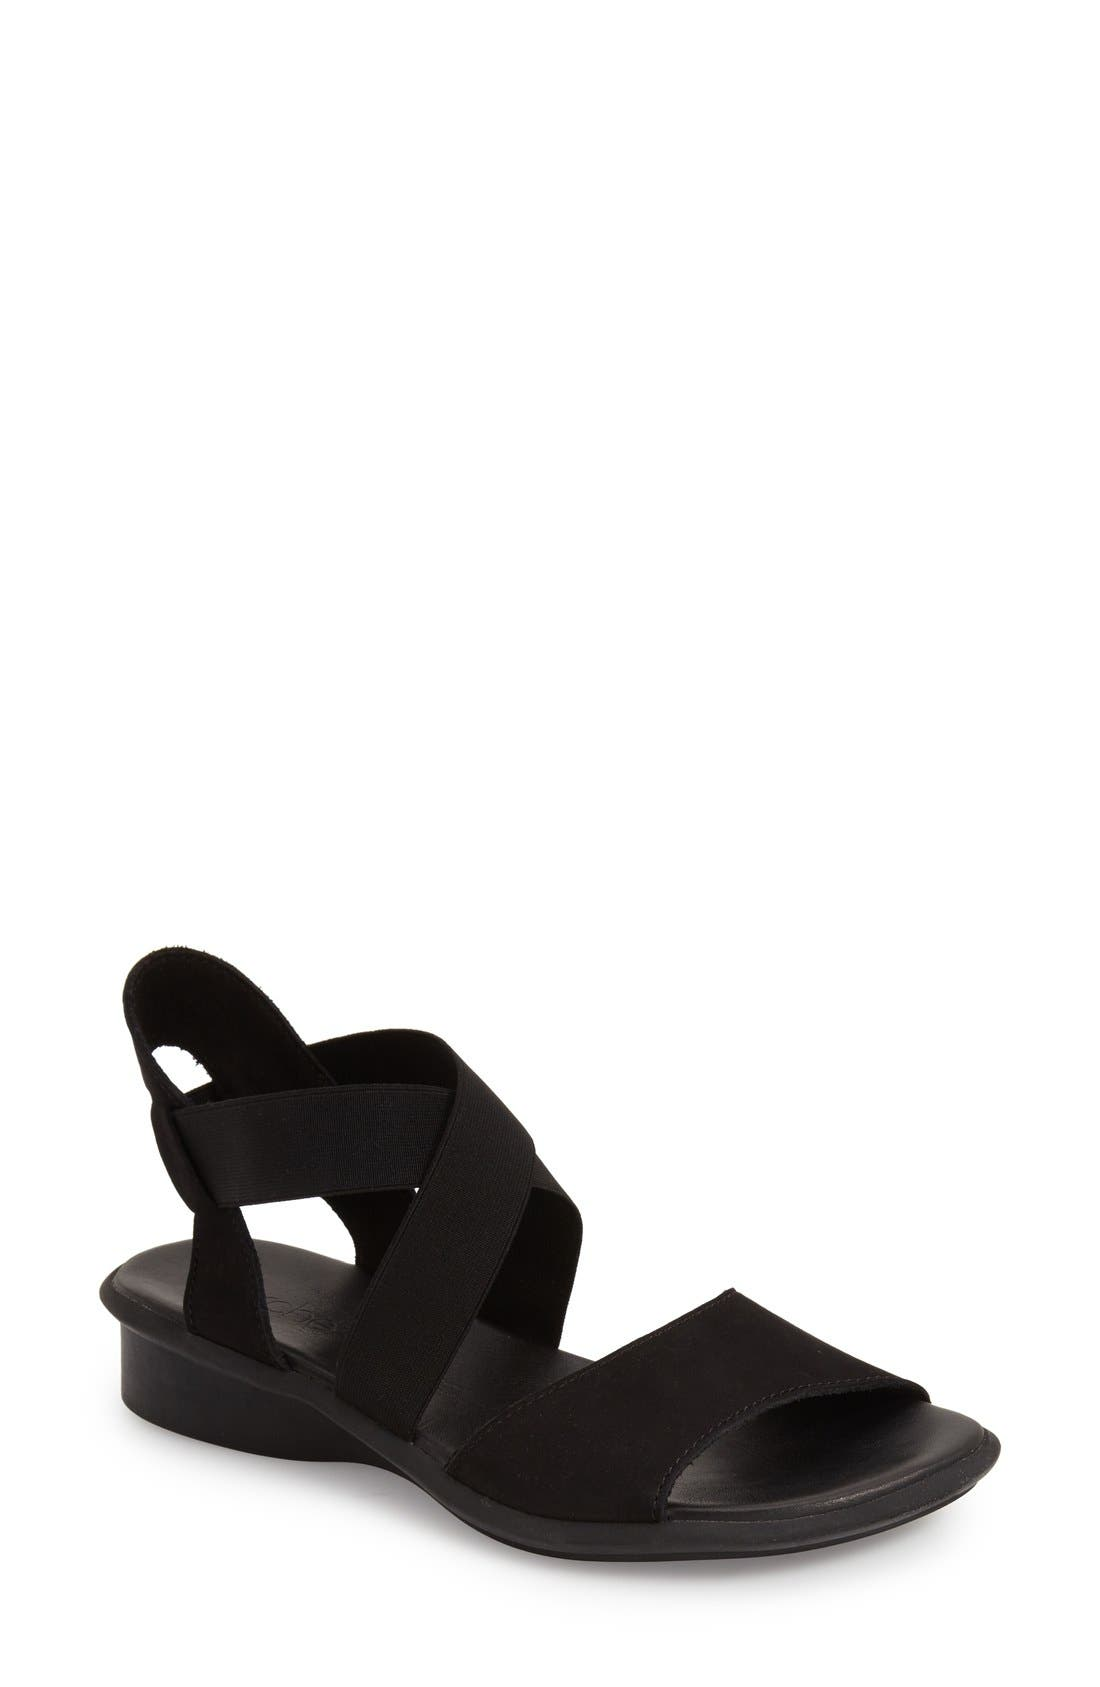 Main Image - Arche 'Satia' Sandal